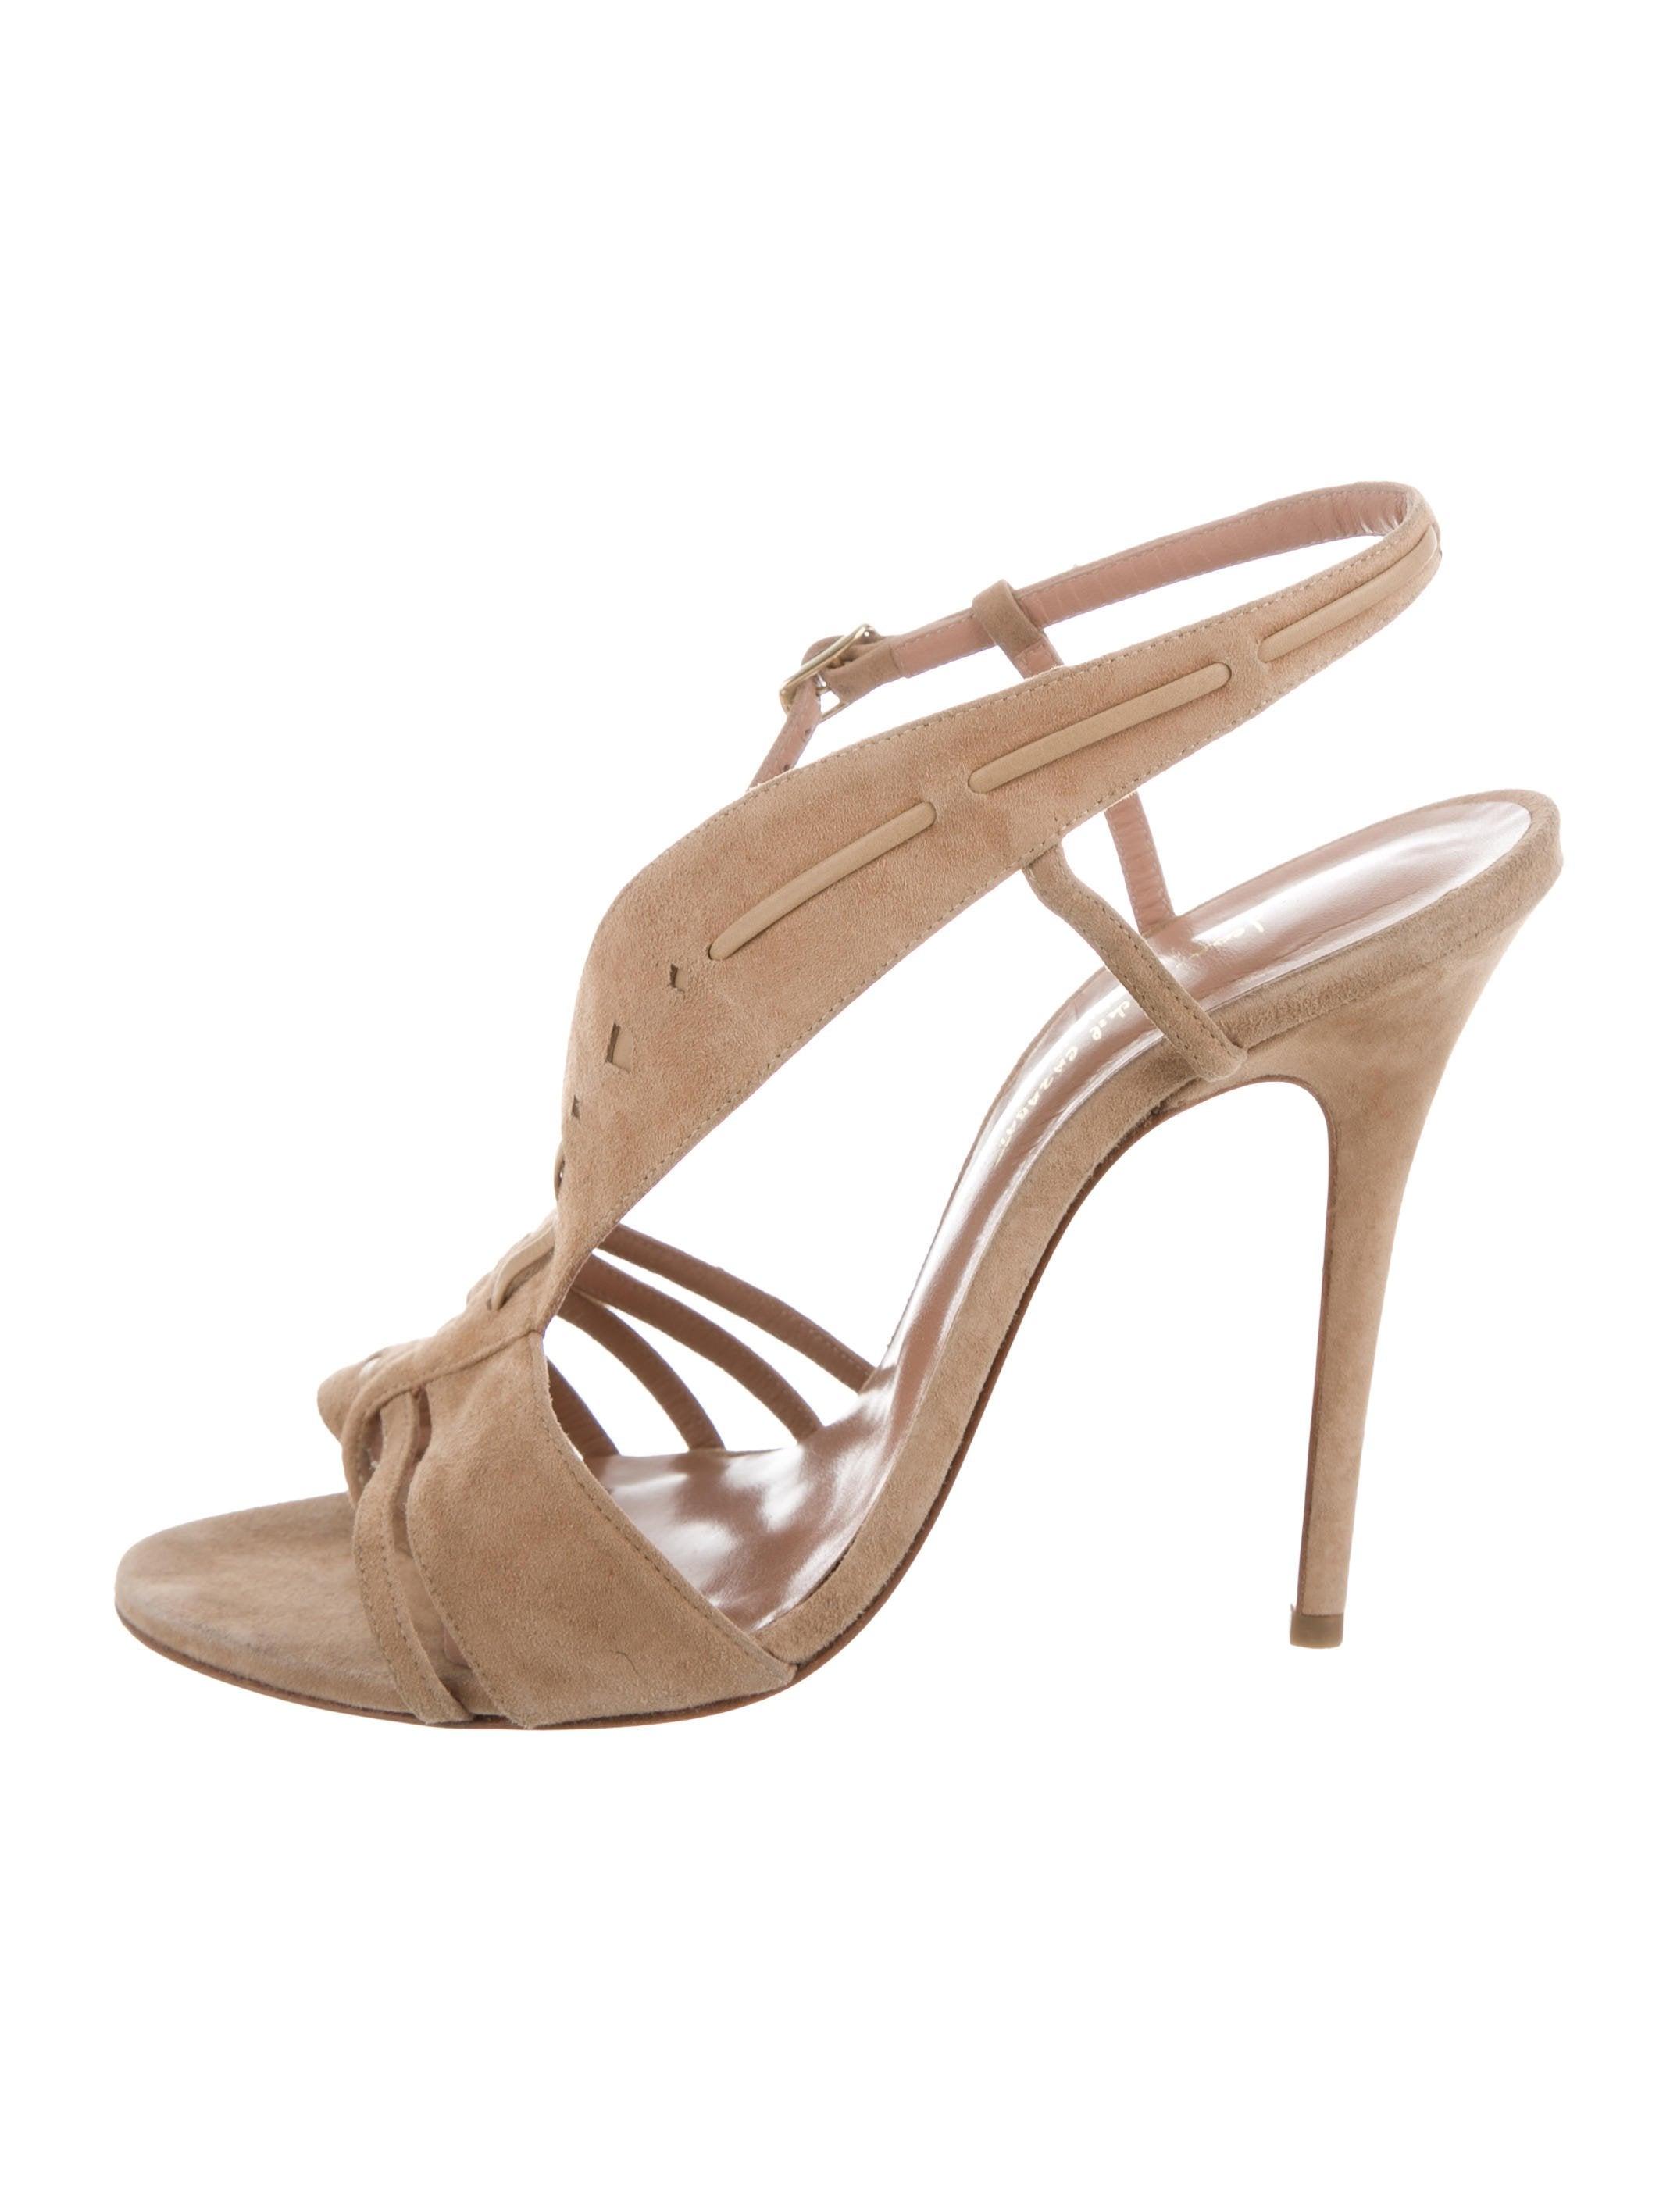 sale under $60 Jean-Michel Cazabat for Sophie Theallet Suede Cage Sandals release dates sale online outlet explore new arrival sale online perfect cheap price eY5Eg